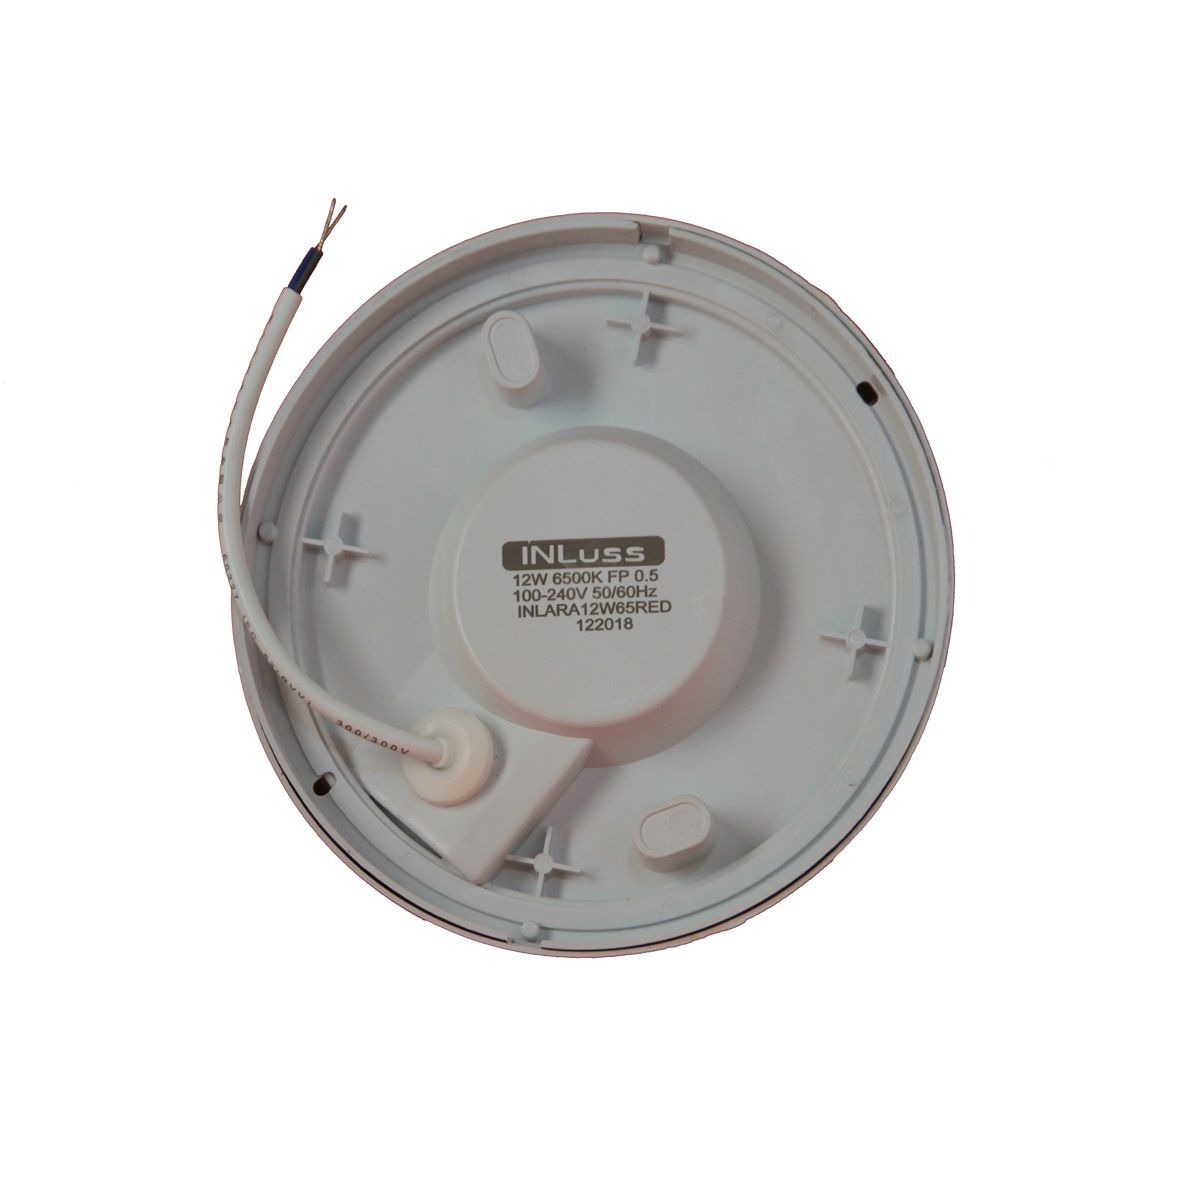 Kit 5 Luminária Led Redonda Área Externa Design Reto 12W Branco Frio Bivolt